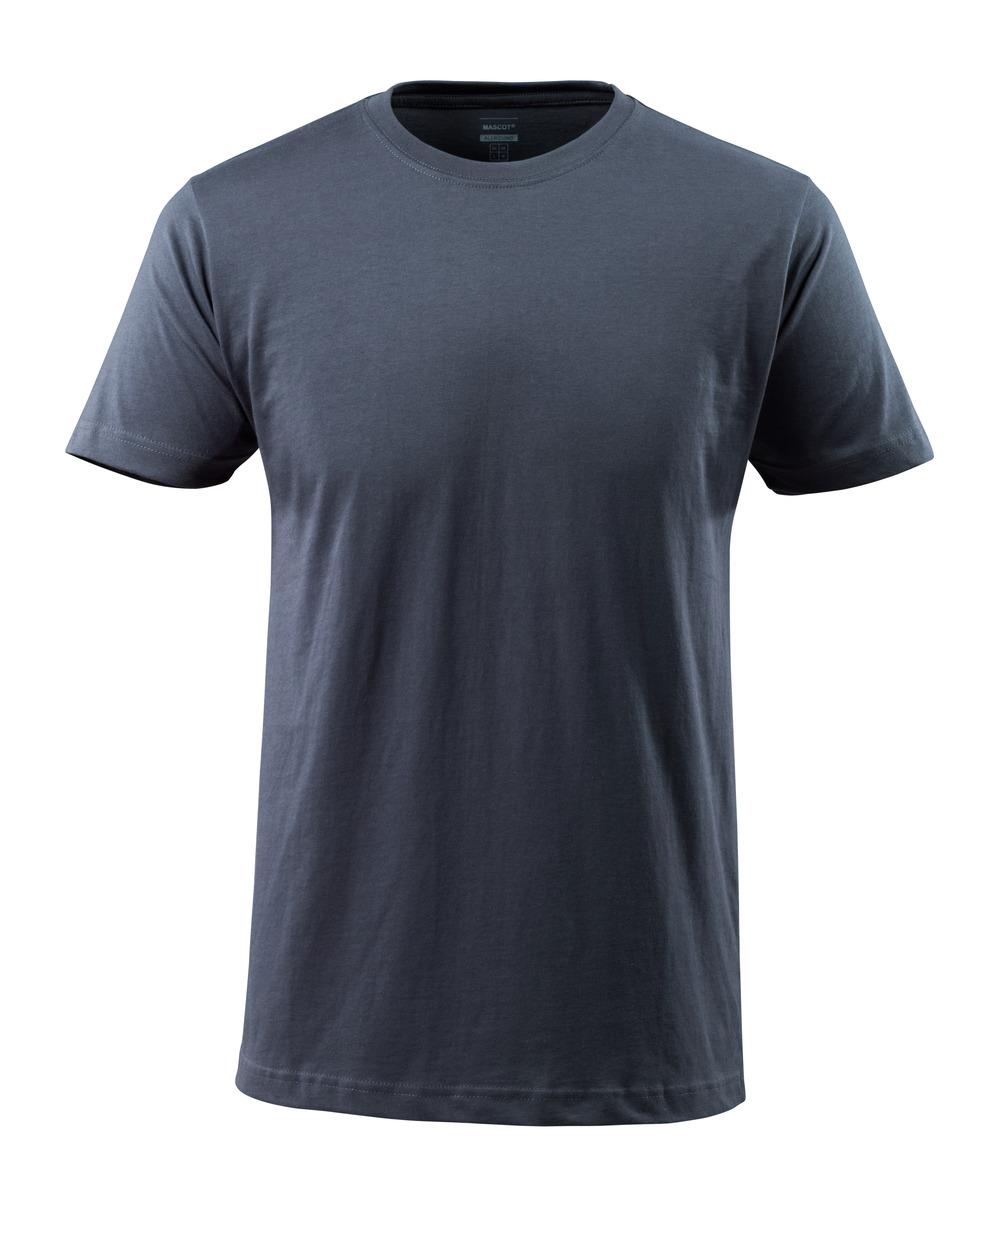 51579-965-010 T-shirt - dark navy